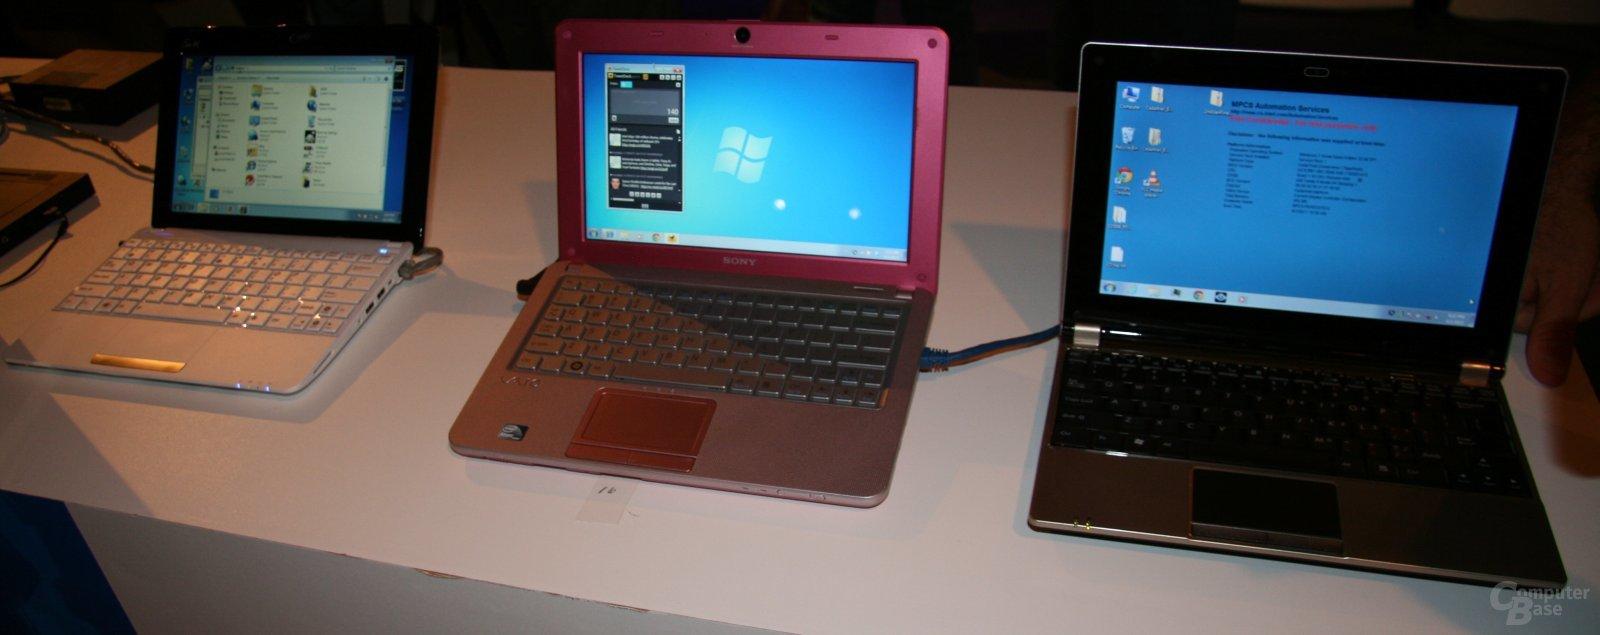 Intel-Pressekonferenz zu Netbooks & Tablets